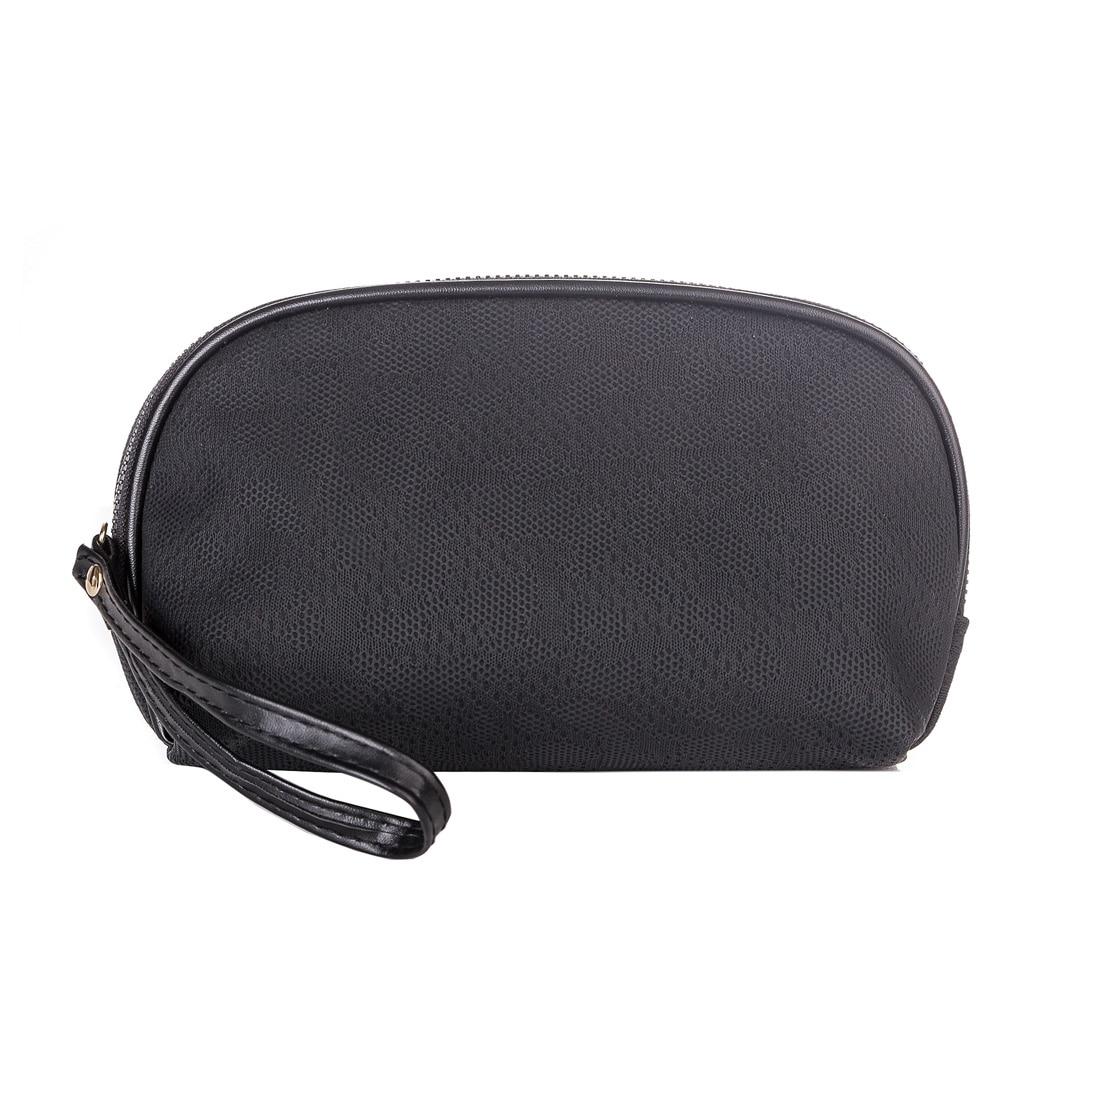 Make Up Bag Lady makeup bag Beauty Cosmetic 2020 New High Quality Cheap Women Cosmetic Bag Makeup Brushes Bag Dropshipping